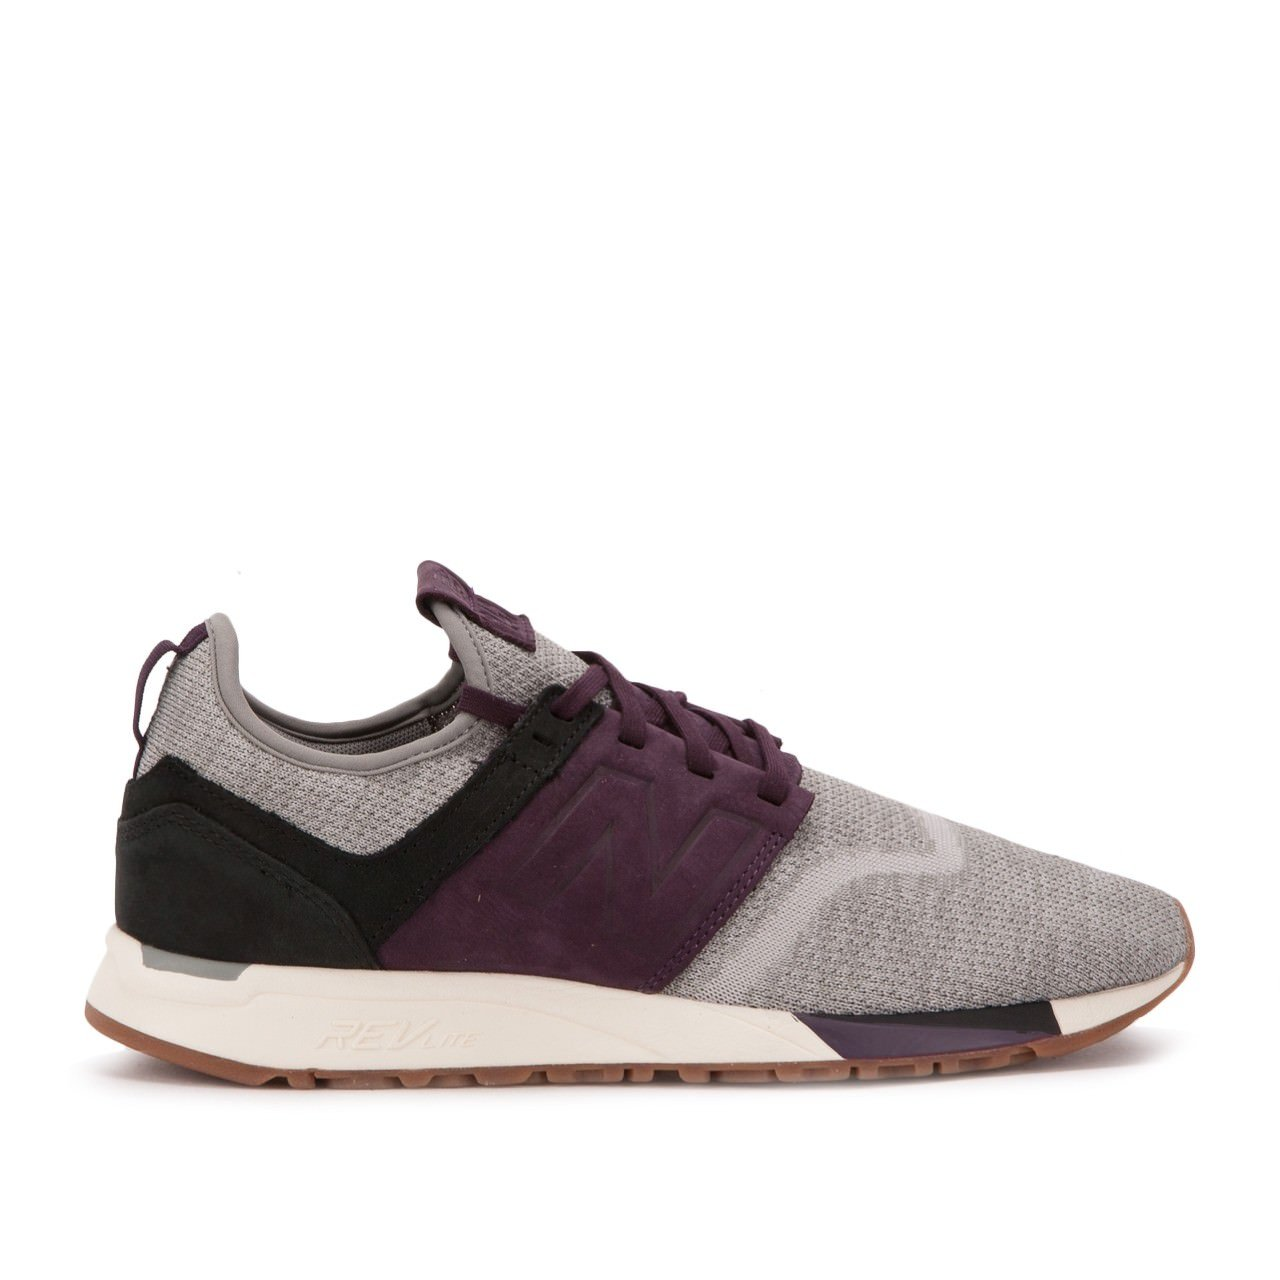 New Balance Herren 247 Classic Mesh Sneaker  13|LM grey-purple